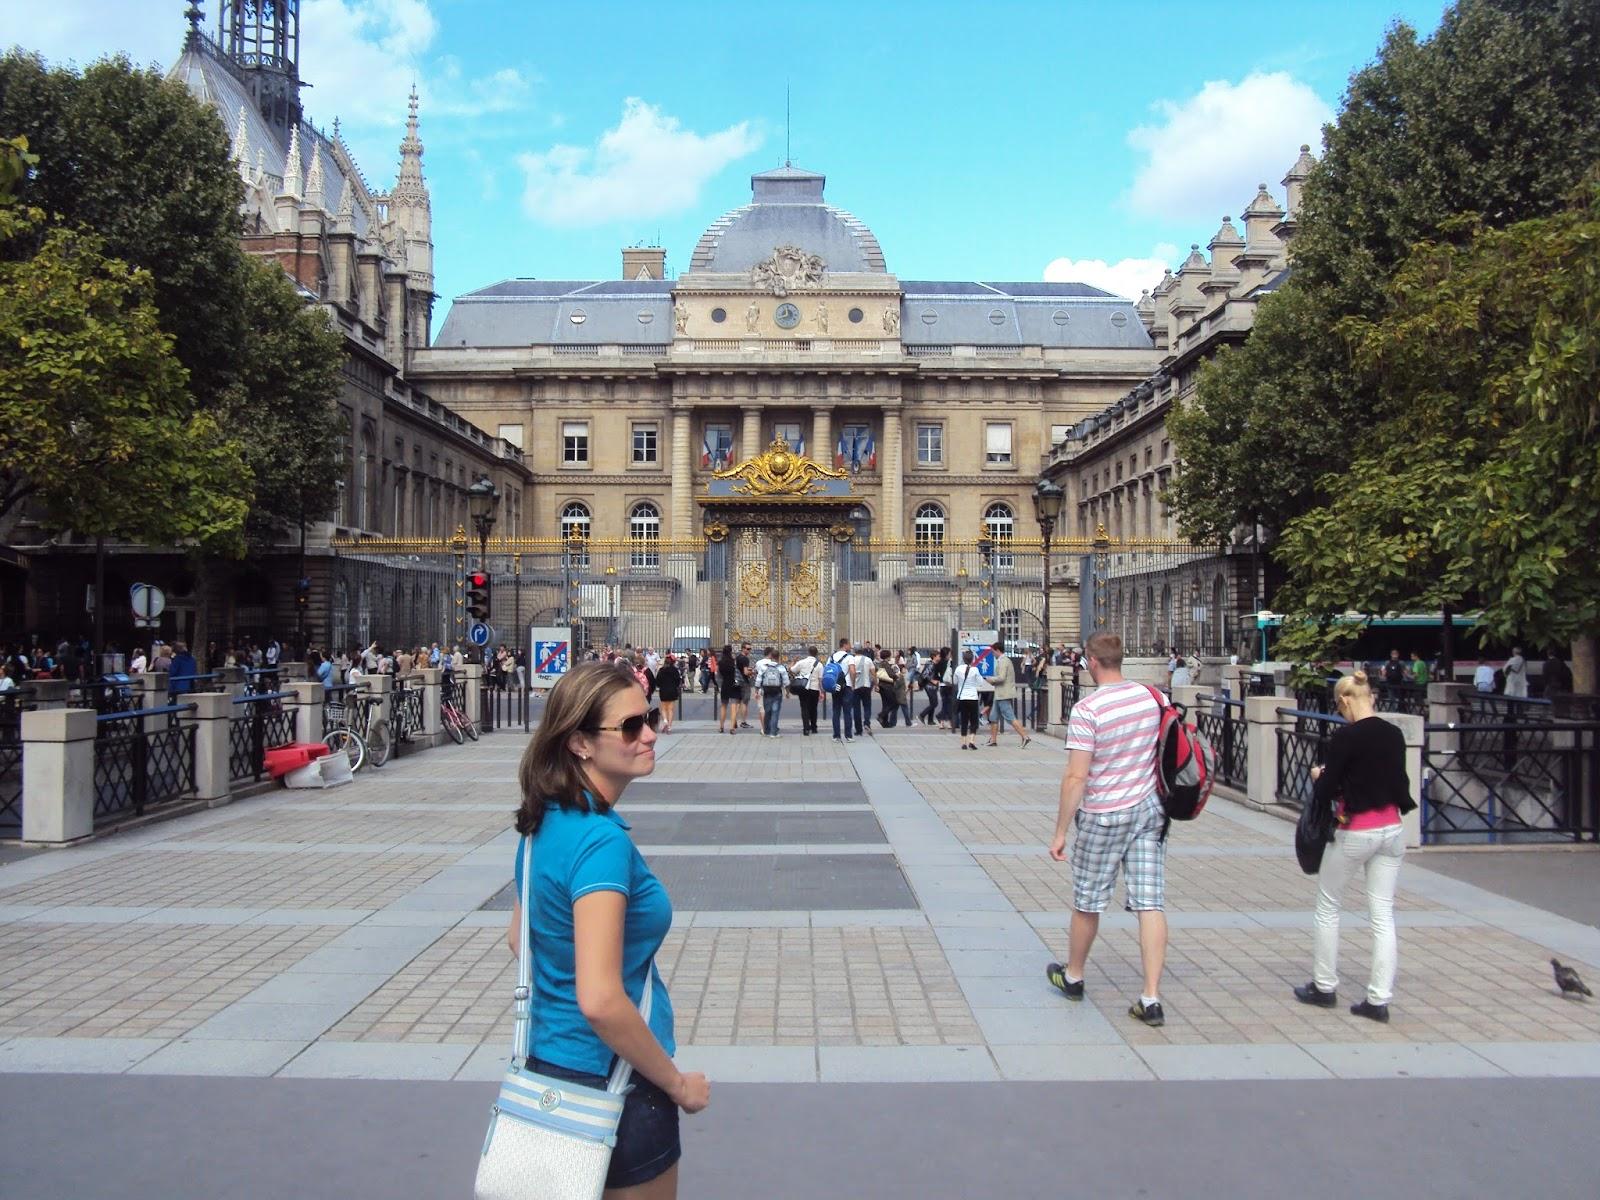 Palácio da Justiça Paris